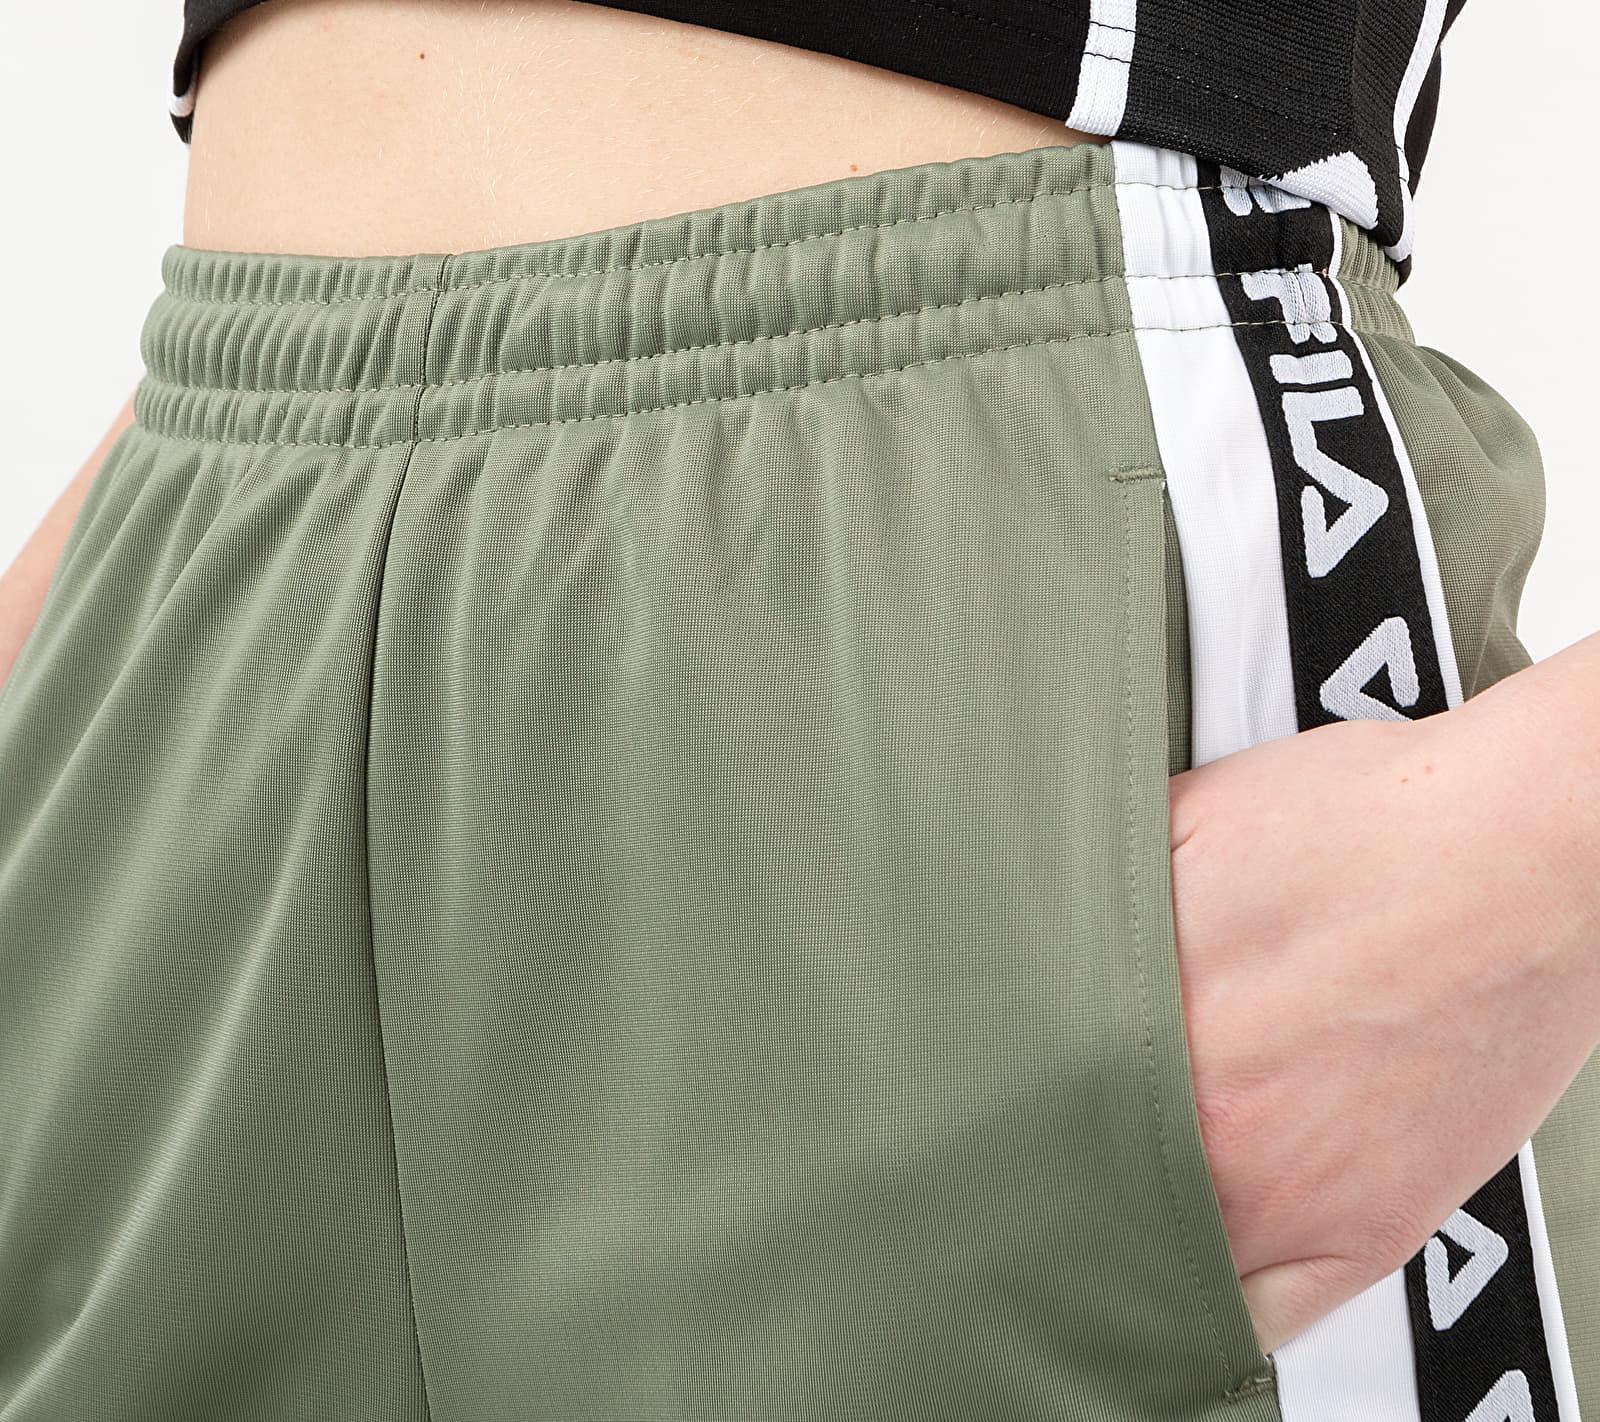 FILA Tarin High Waist Shorts Sea Spray/ Bright White, Green